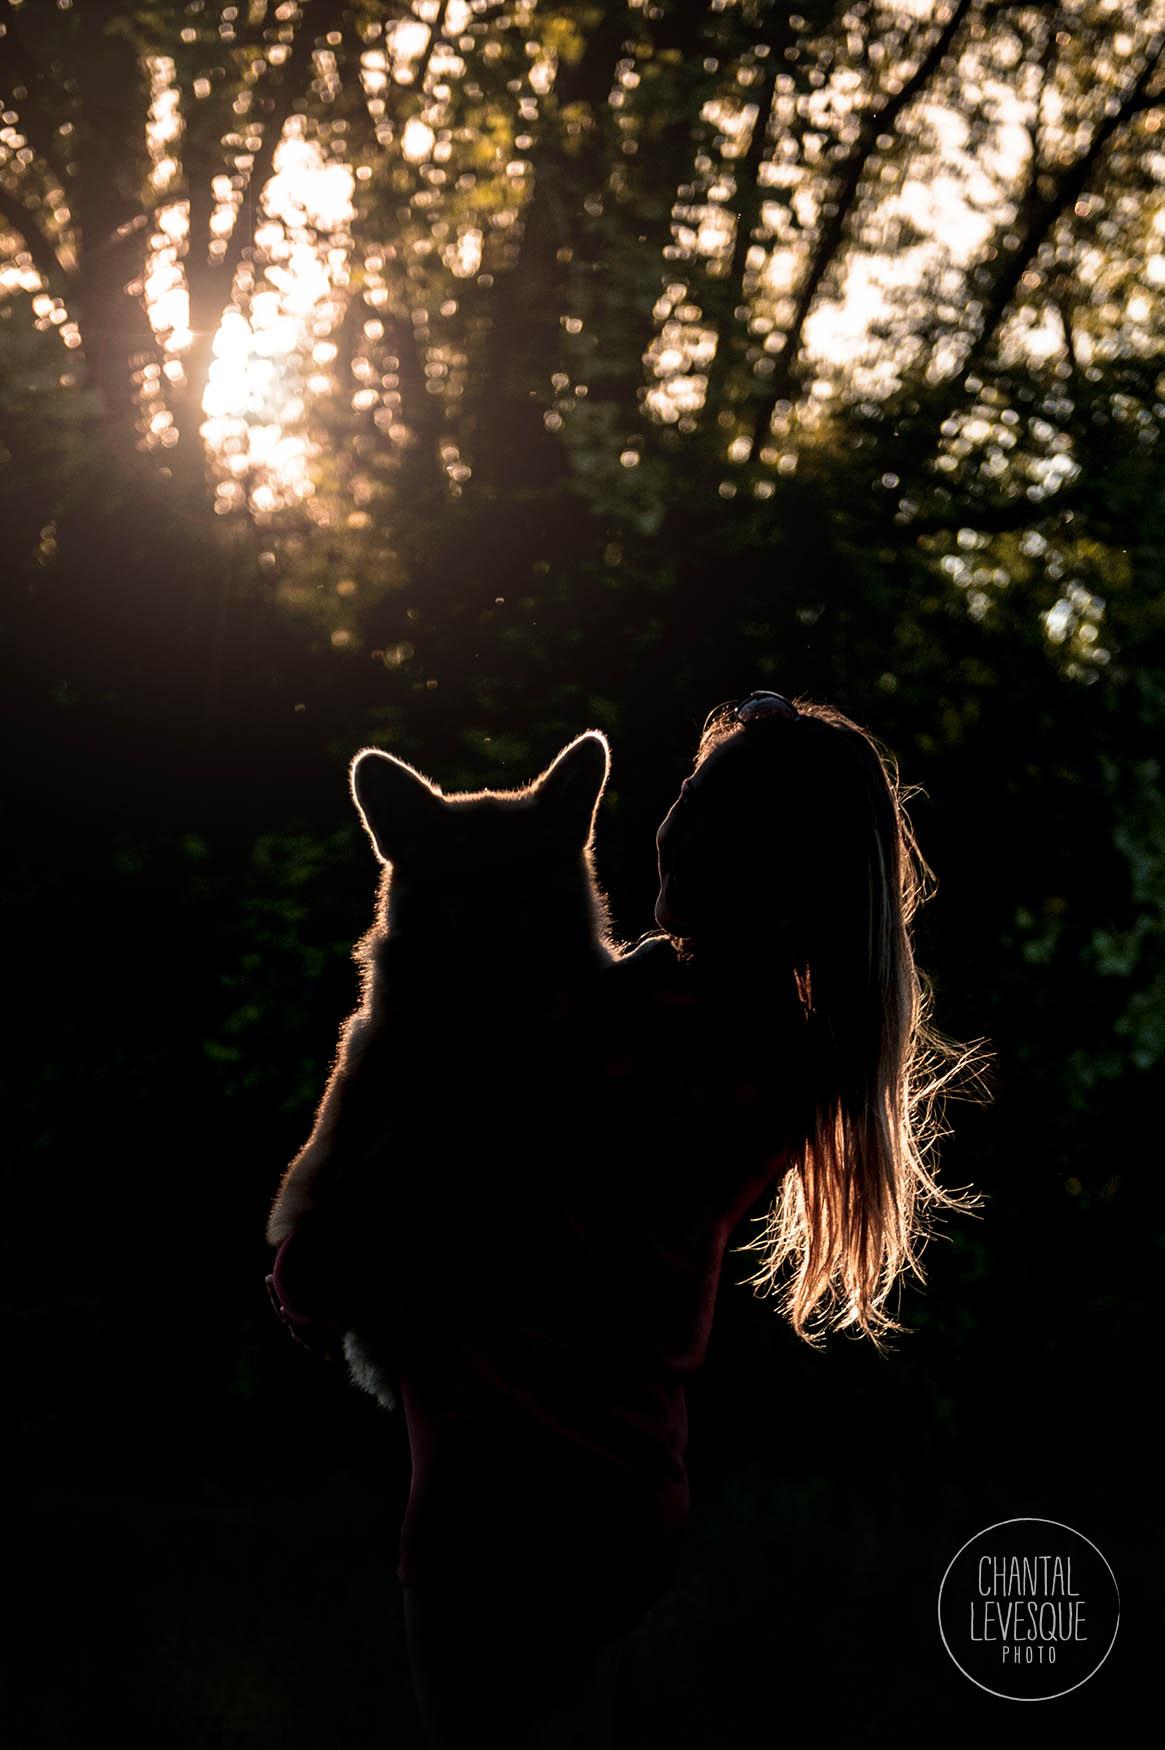 corgi-sunset-photography-quebec.jpg